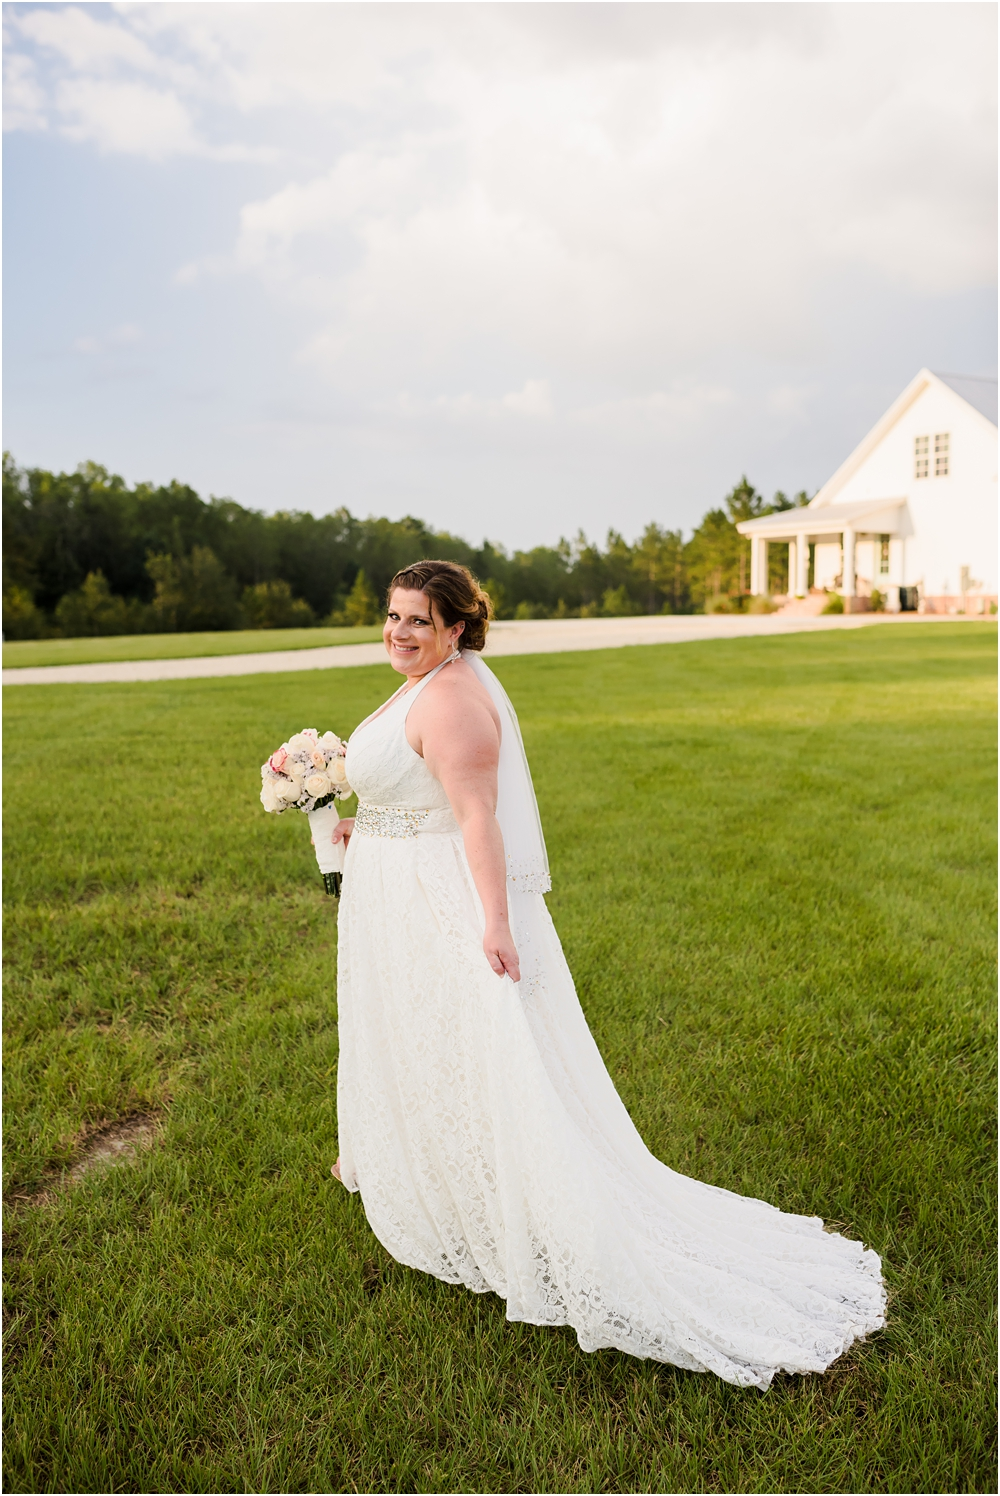 mosley-wedding-kiersten-stevenson-photography-30a-panama-city-beach-dothan-tallahassee-(242-of-472).JPG